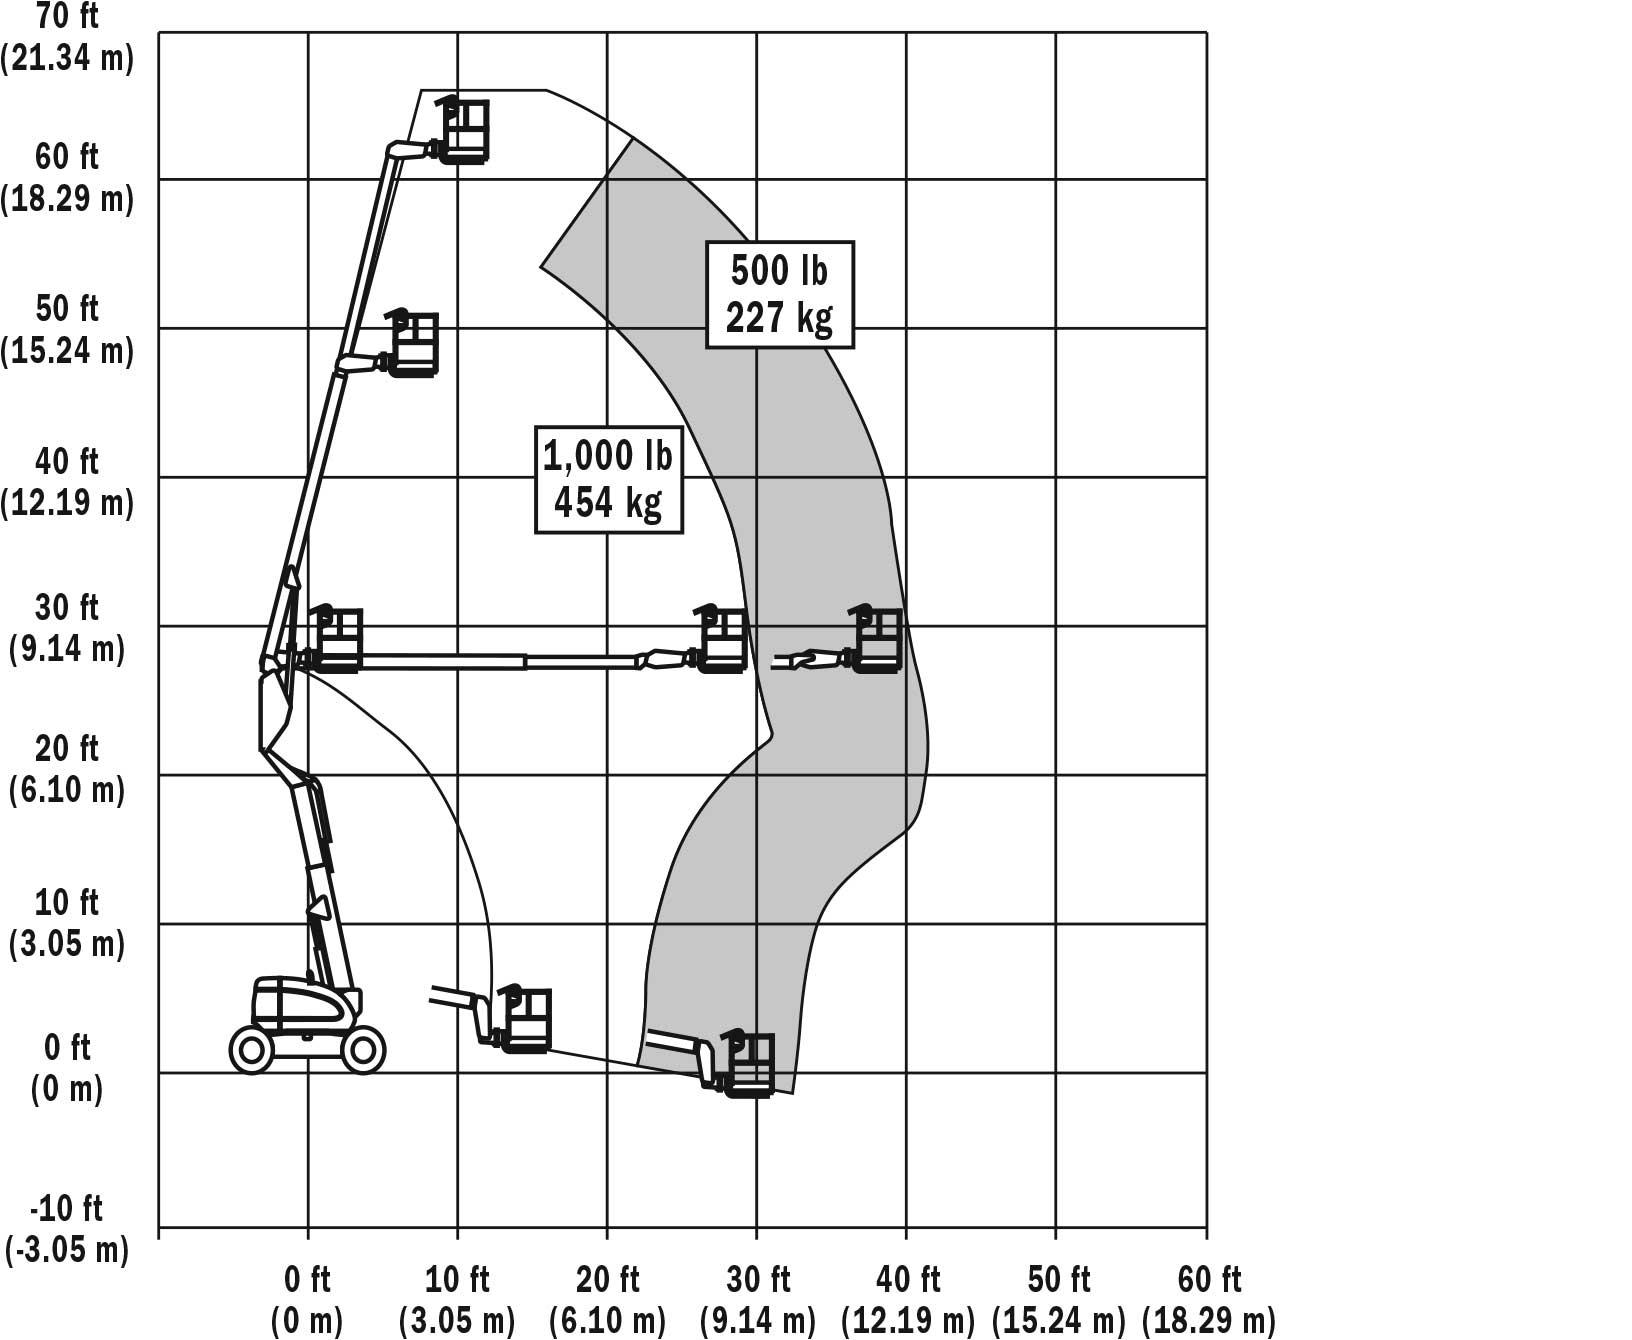 JLG 600AN Articulating Boom Lift Reach Diagram